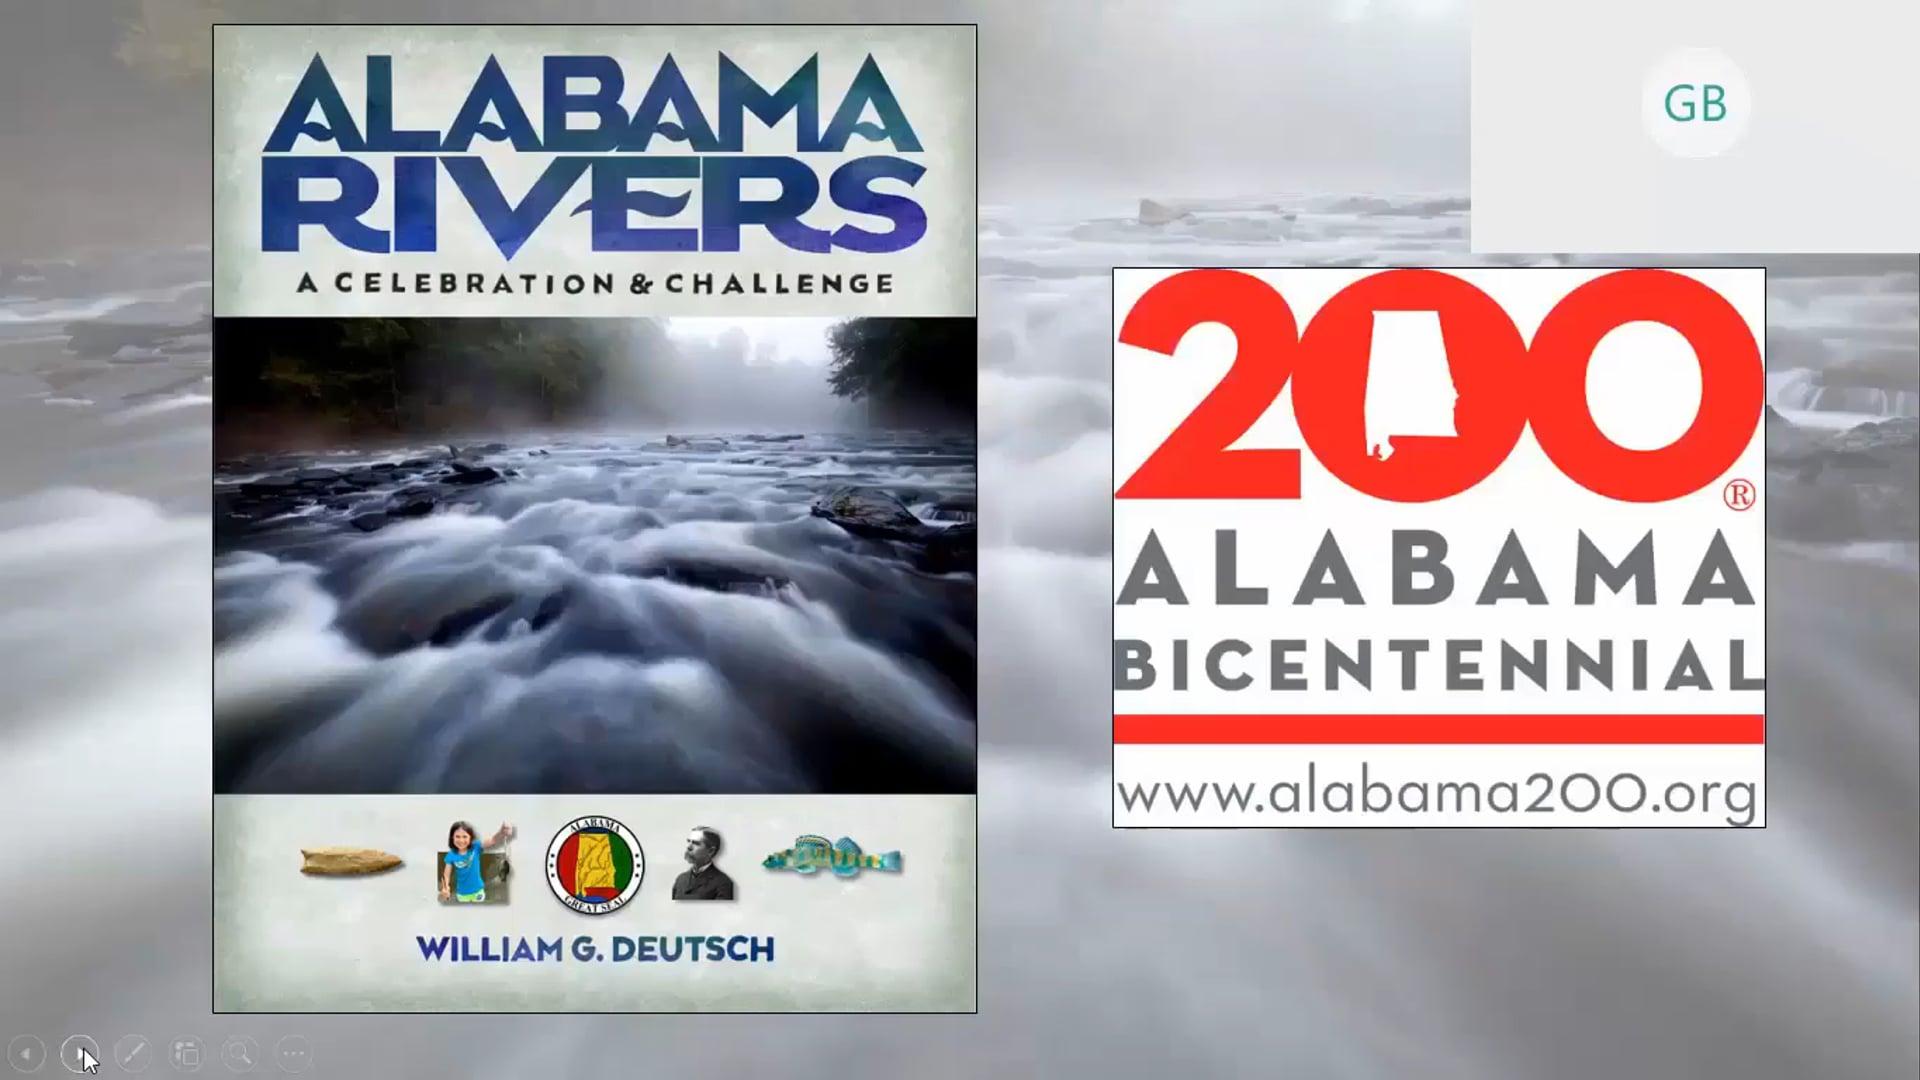 Quarterly Webinar Series (5/22/19) - author and aquatic ecologist Dr. William Deutsch